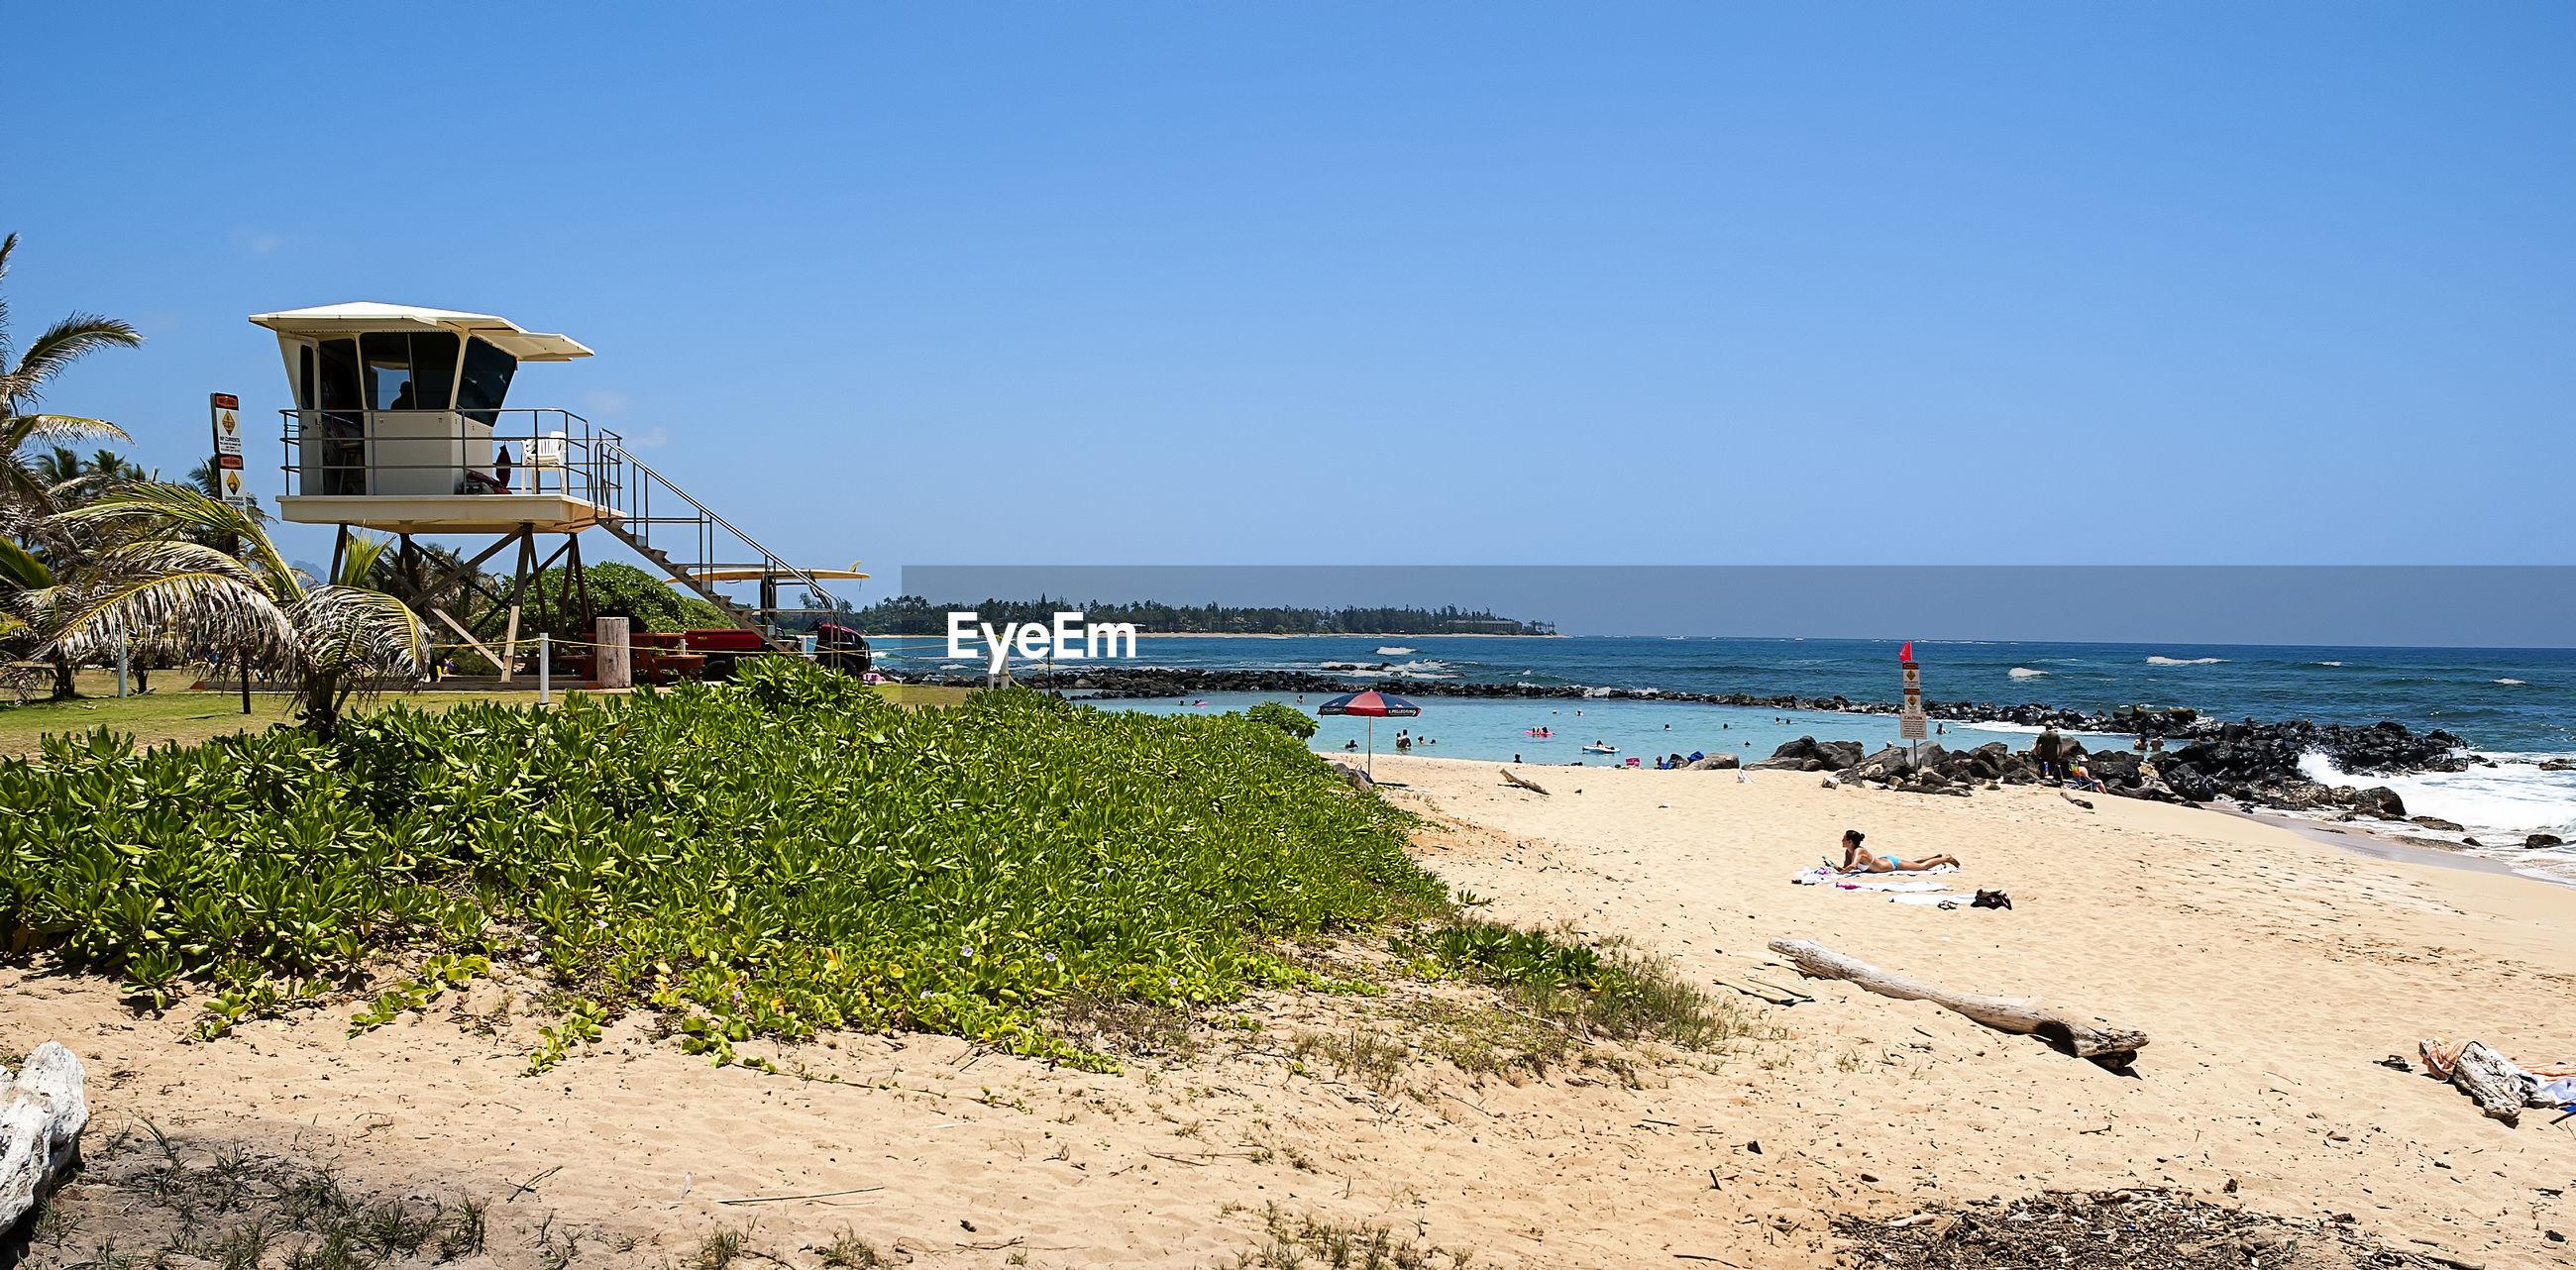 Lifeguard hut at beach in hawaiian paradise park against clear sky